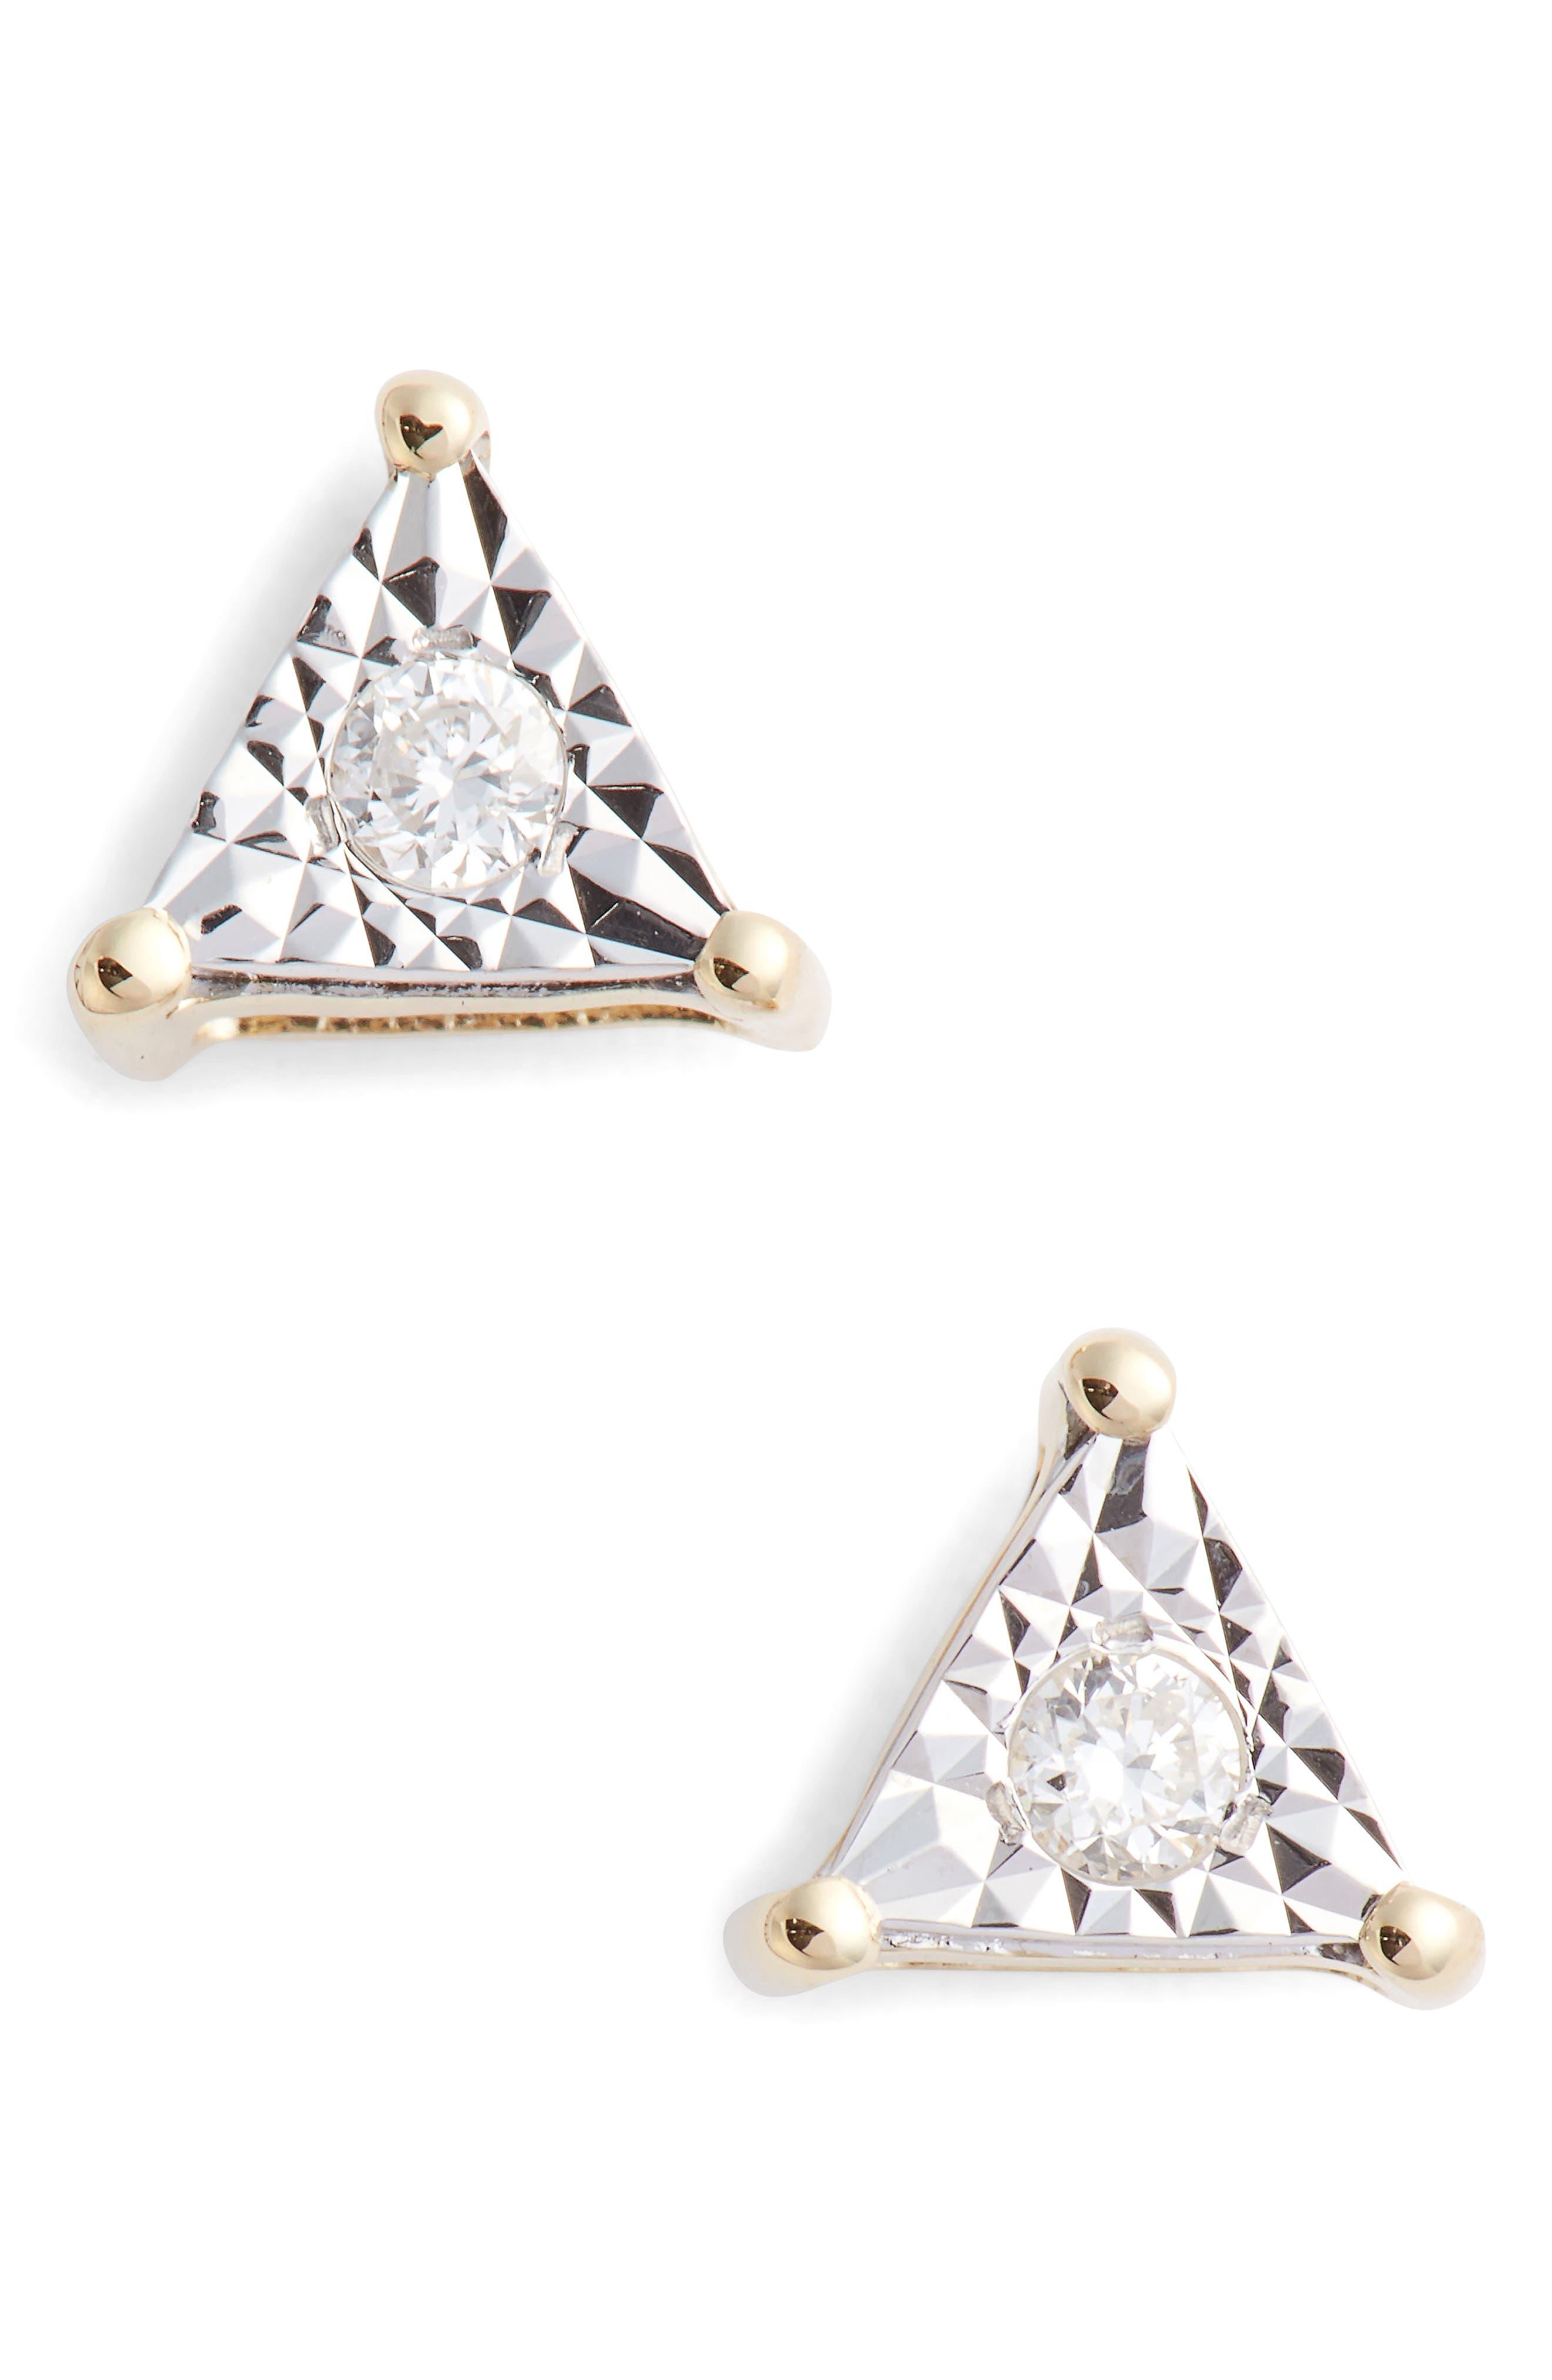 Emily Sarah Diamond Triangle Stud Earrings,                             Main thumbnail 1, color,                             YELLOW GOLD/ DIAMOND